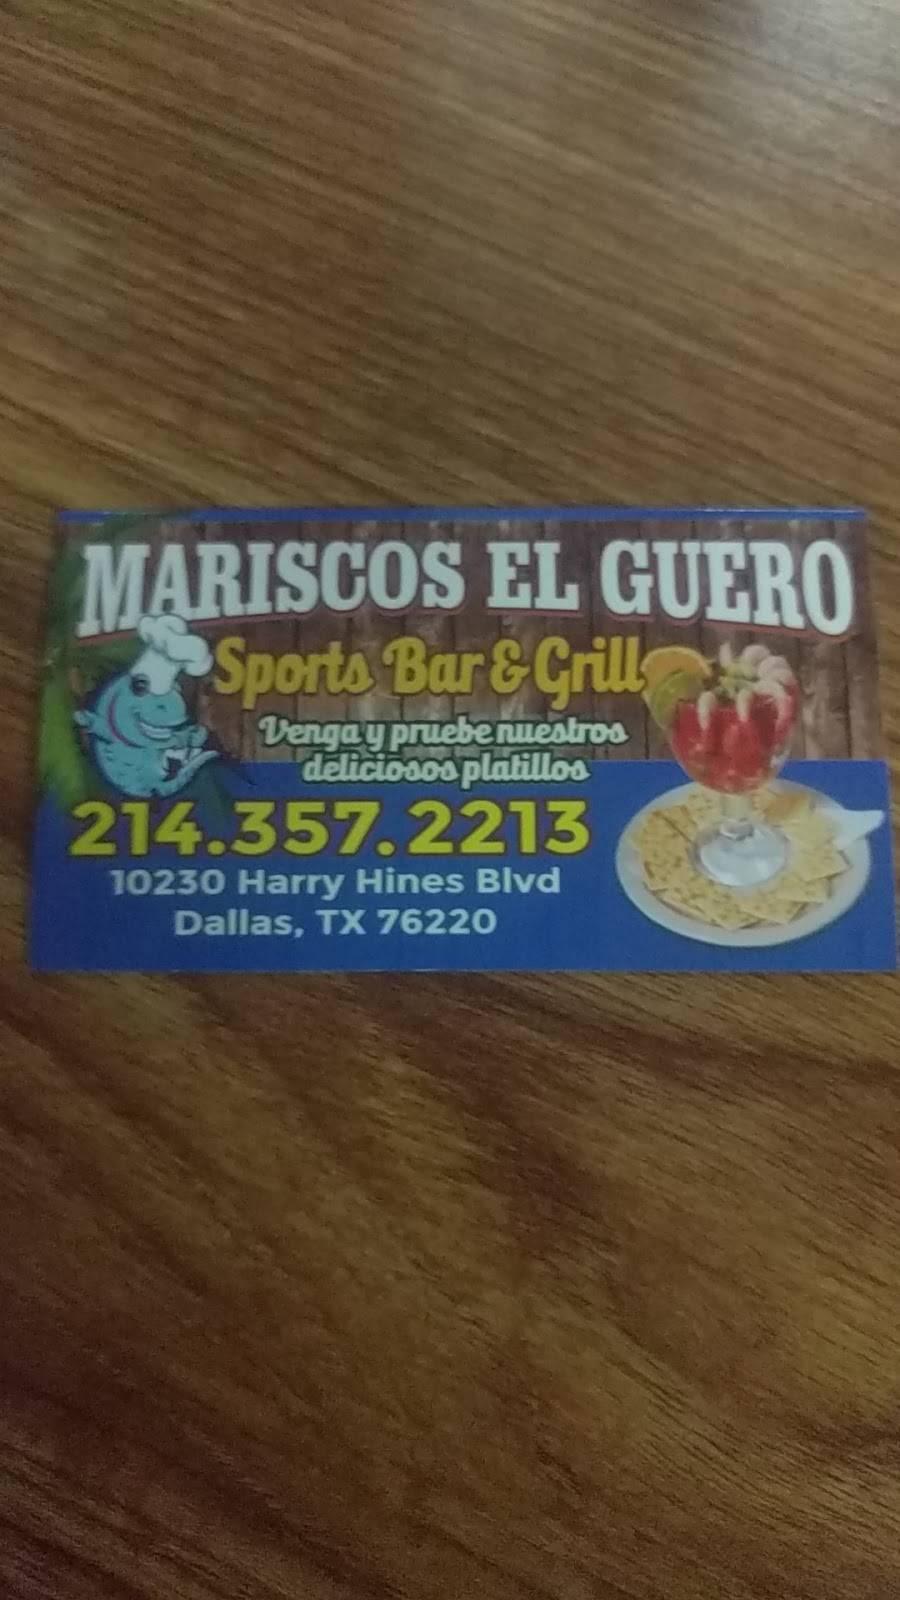 El Guero seafood mariscos comida mexicana - restaurant  | Photo 9 of 9 | Address: 10230 Harry Hines Blvd, Dallas, TX 75220, USA | Phone: (214) 357-2213